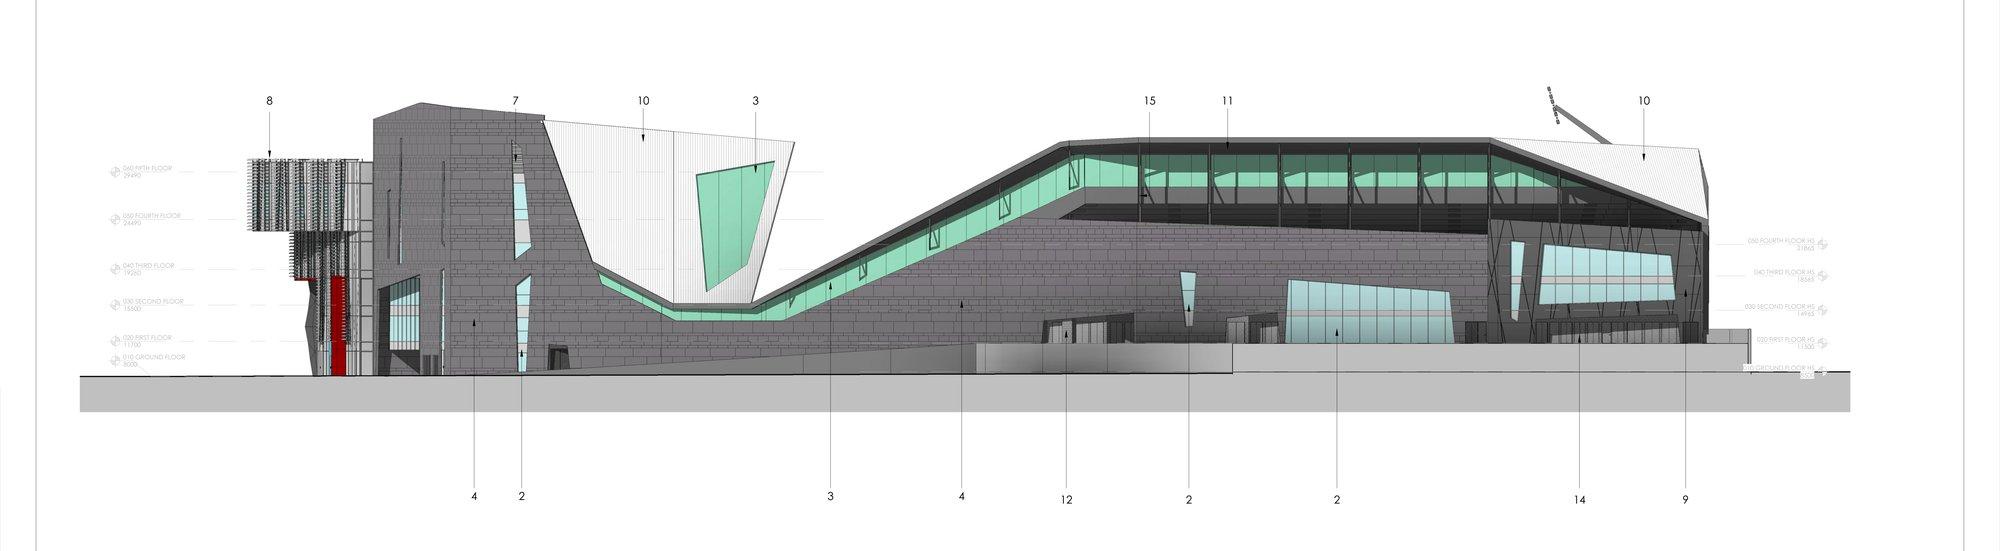 Design Brentford Community Stadium Stadiumdb Com